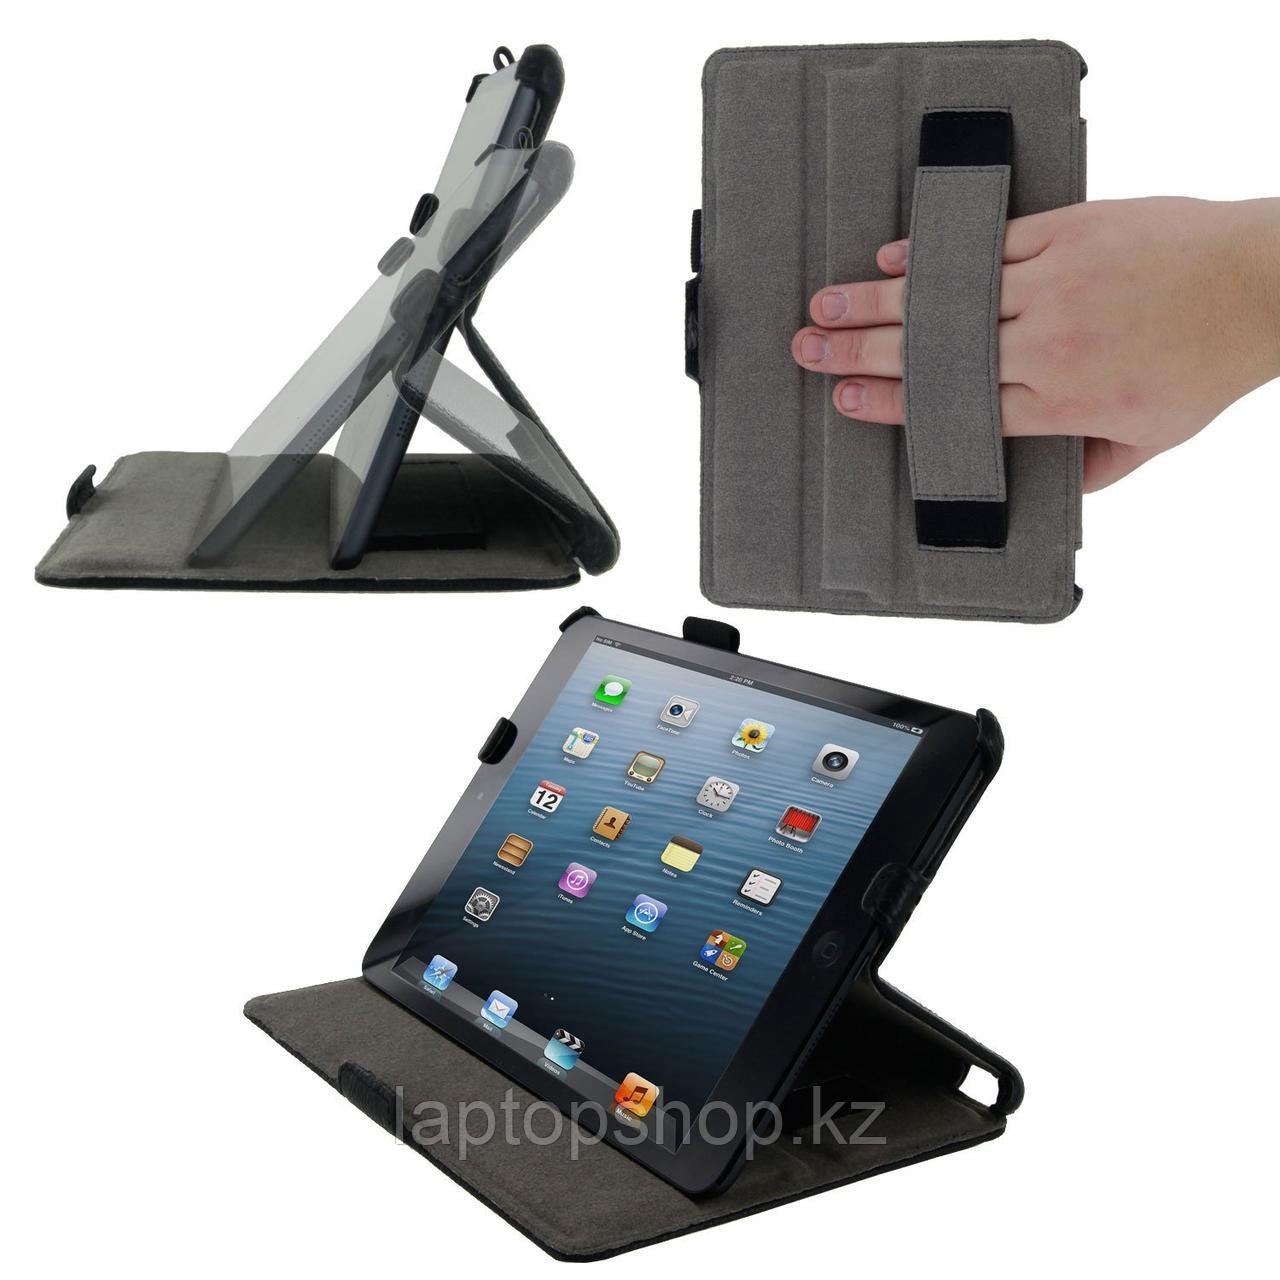 Чехол на планшет RooCase Slim Fit Folio Case Cover Sleeve Stand Adjustable for Apple iPad Mini Black